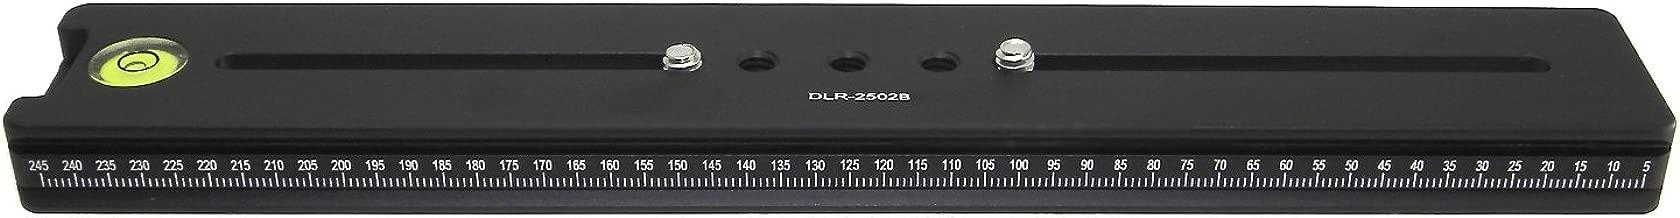 DLR-2502B Desmond 250mm Double Macro Rail Arca-Swiss Compatible with Bubble Level